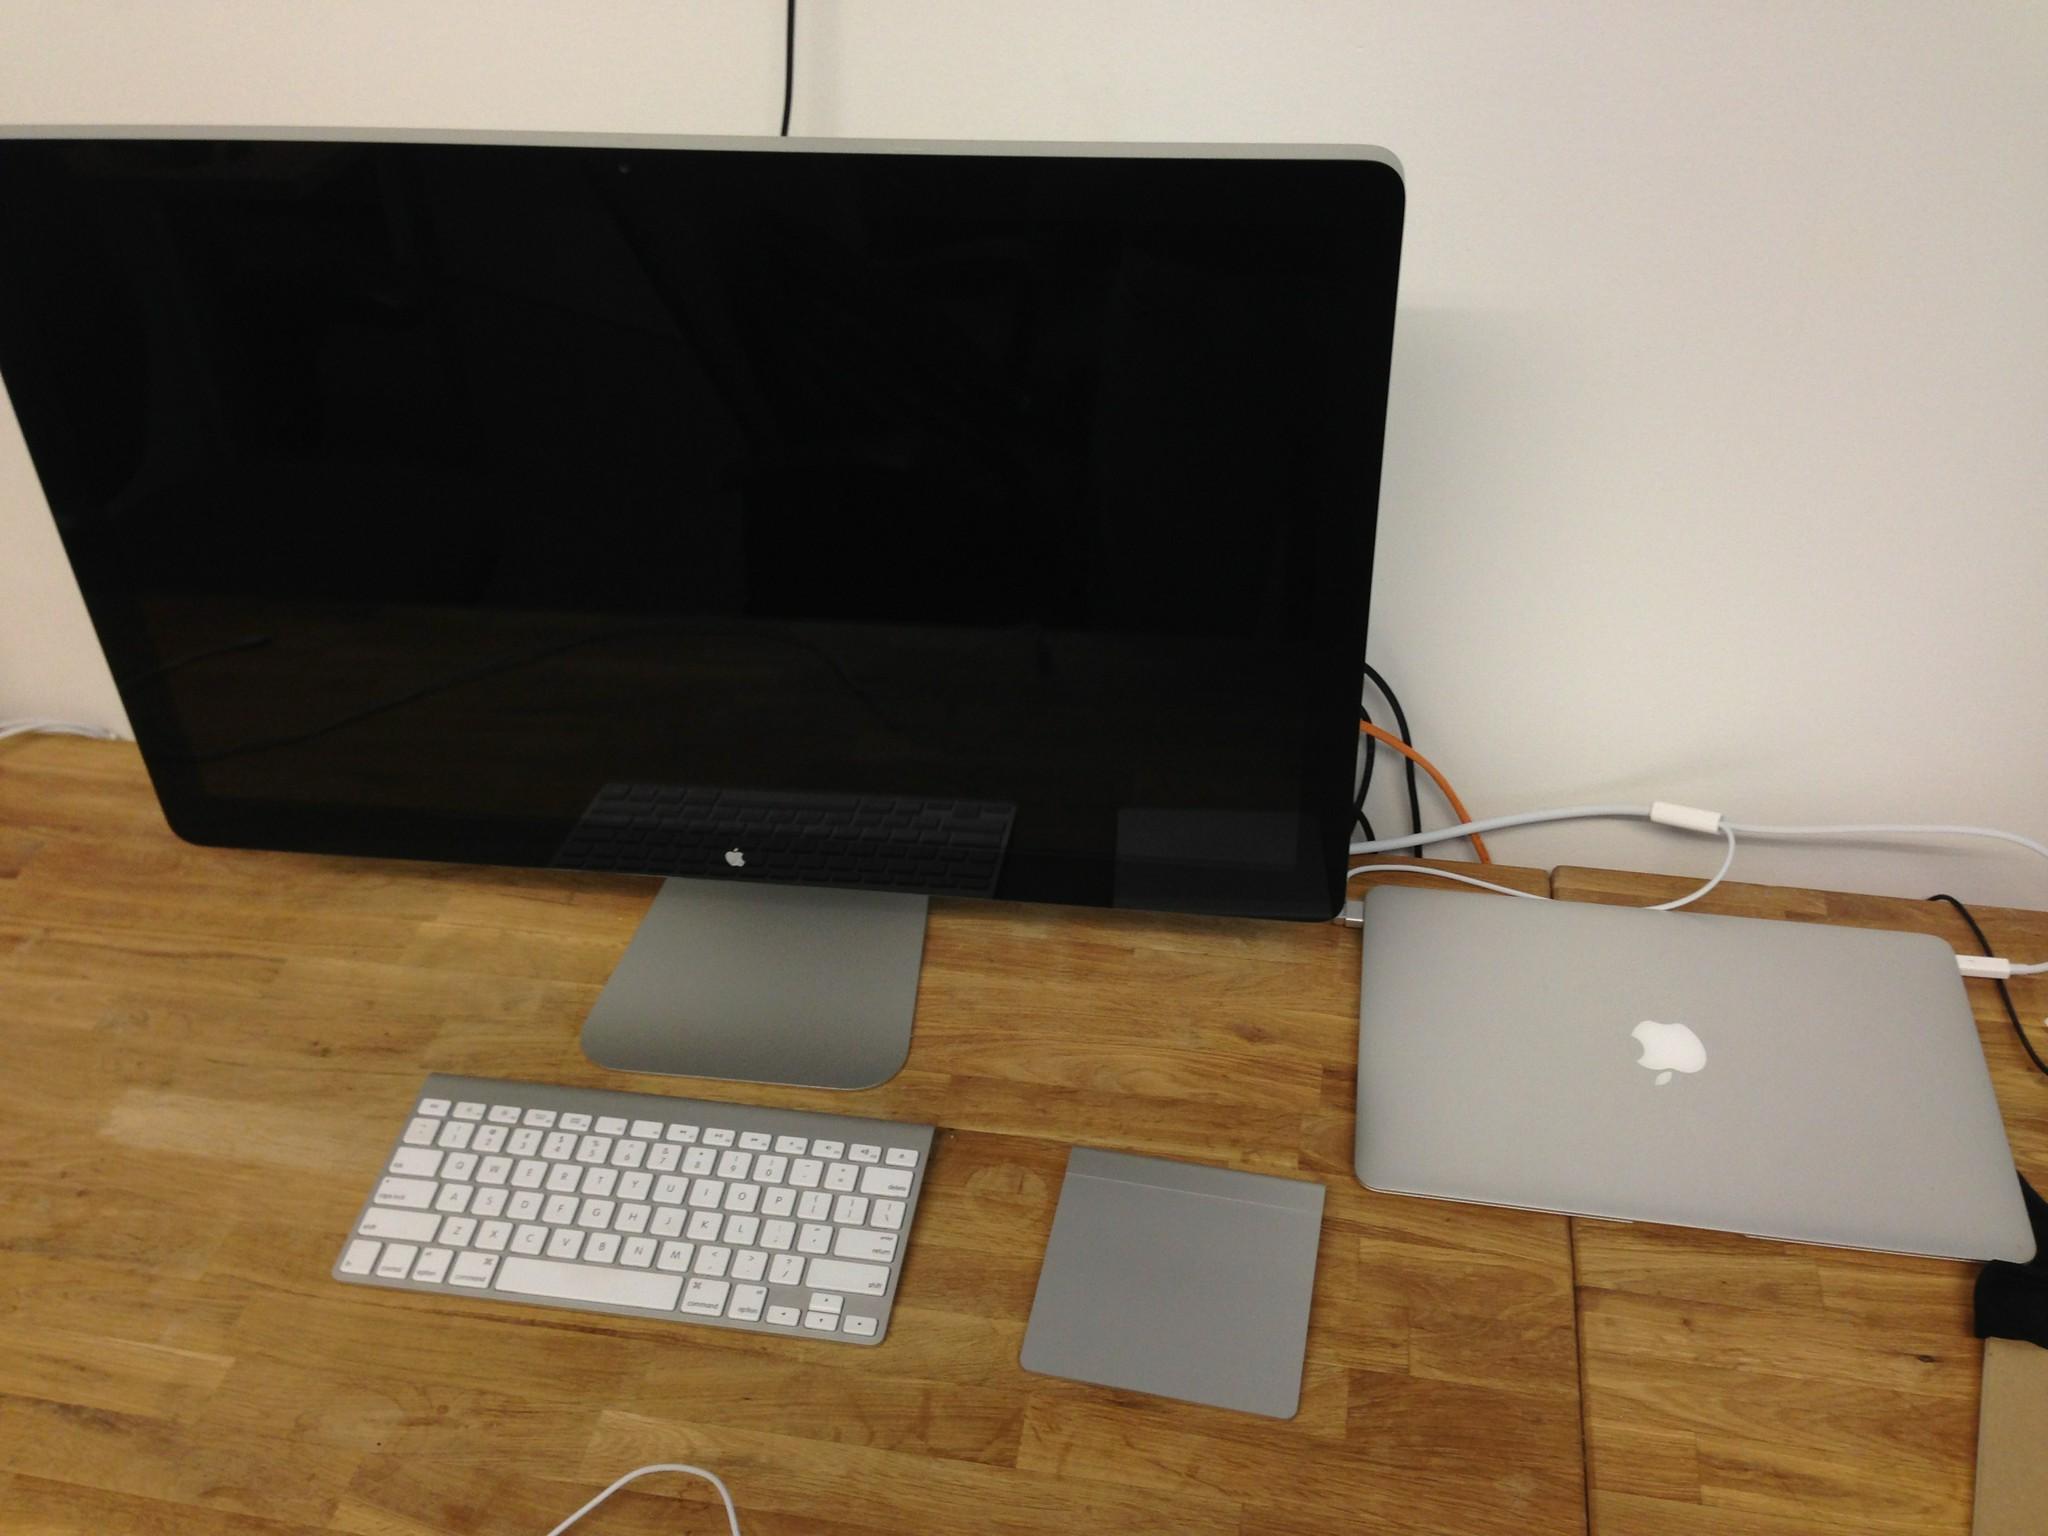 Apple Magic Keyboard (first generation)